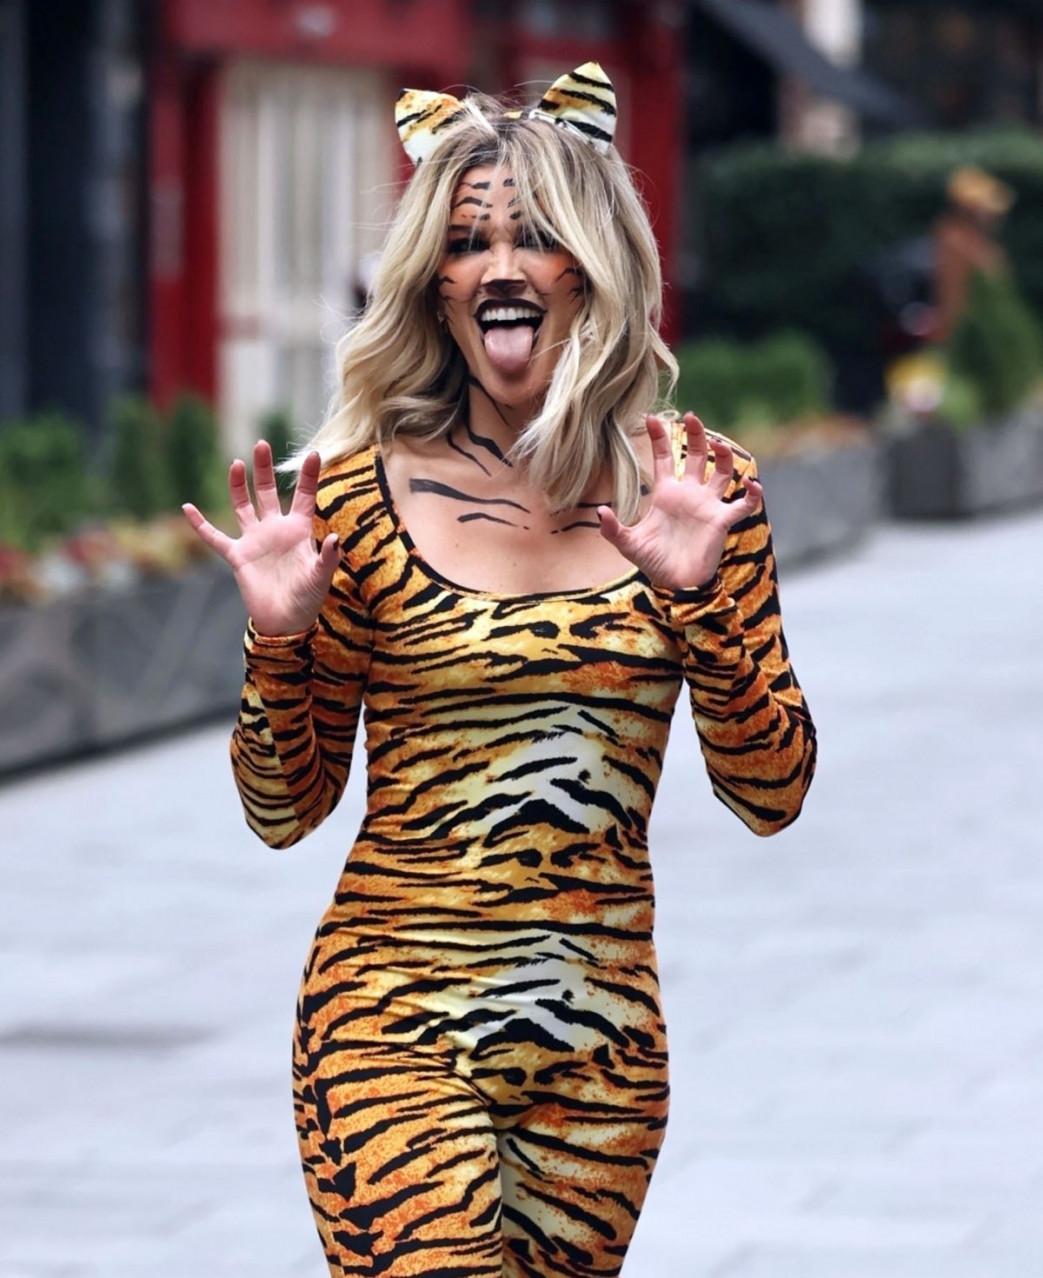 Ashley-Roberts-Stunning-in-Tiger-Catsuit-8.jpg